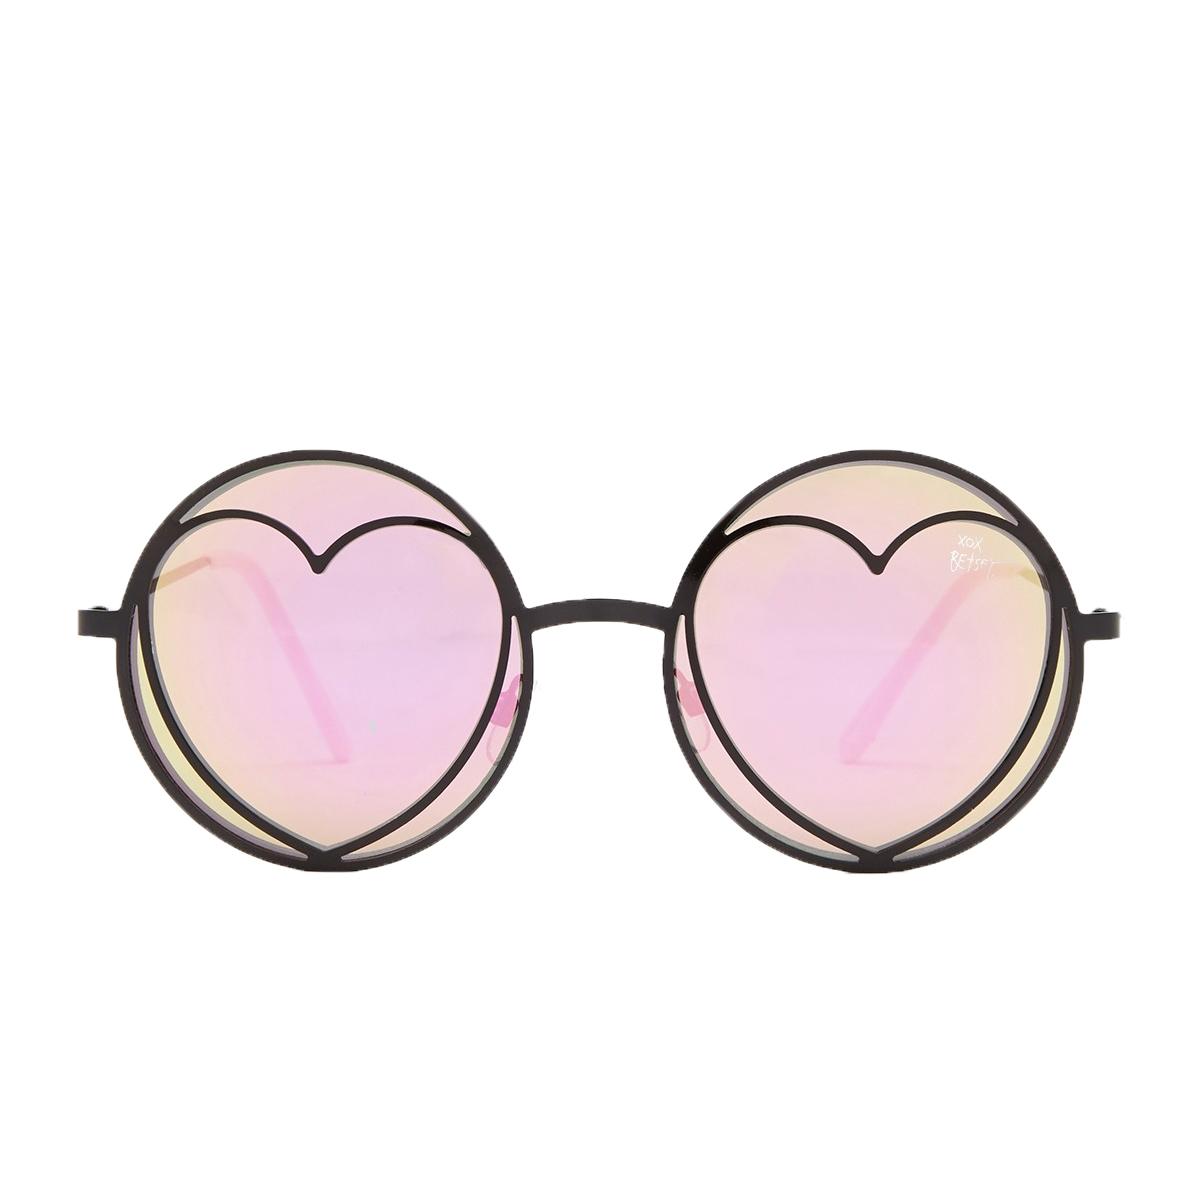 8a5a83b8e7 Betsey Johnson Funky Heart Lennon Round Sunglasses